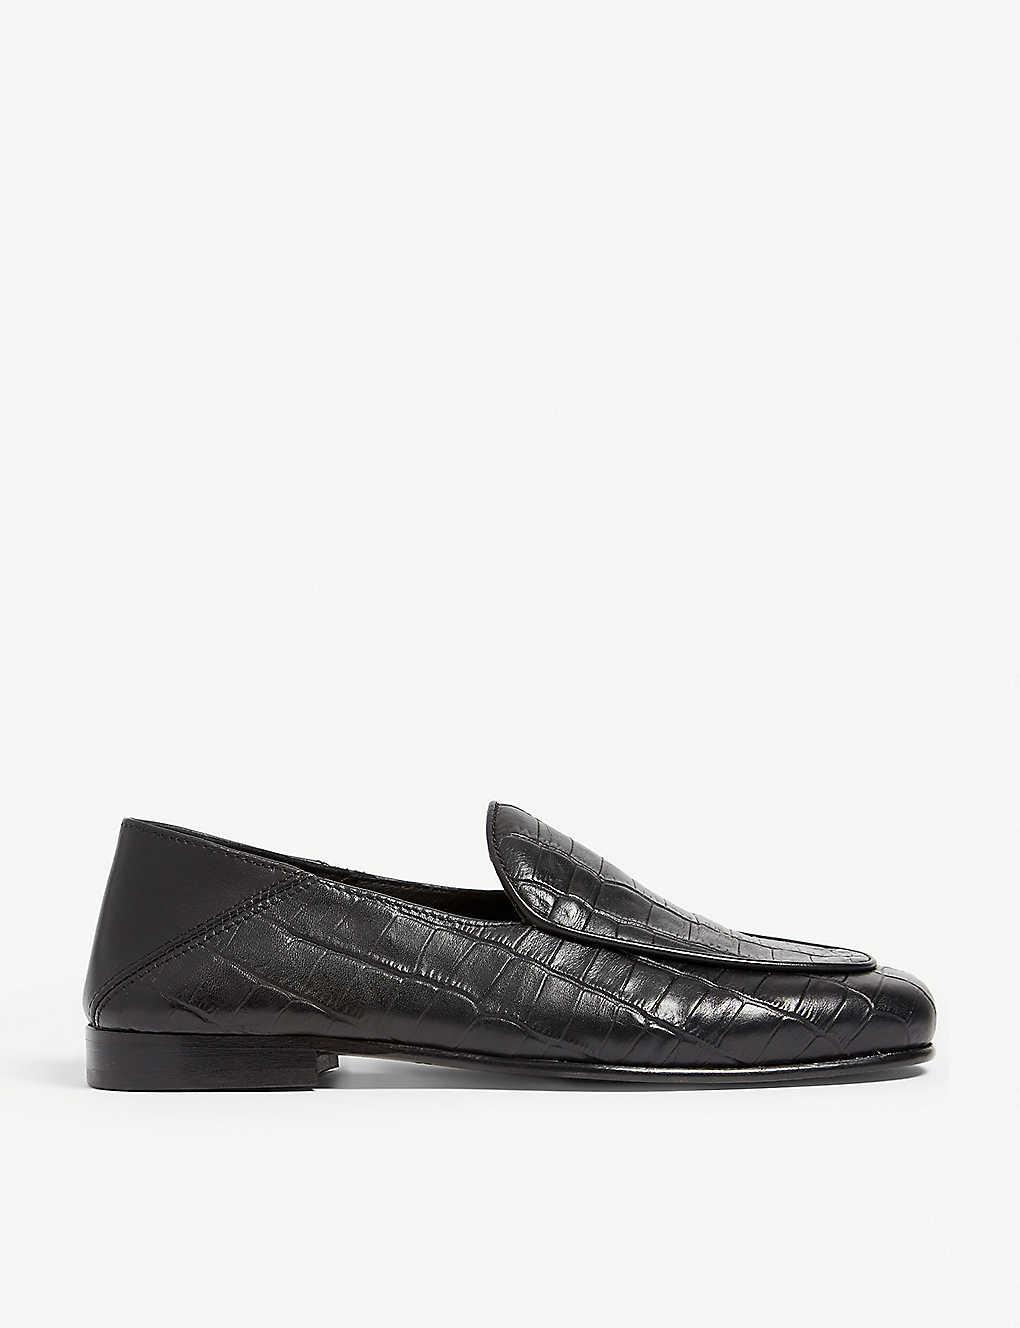 9c28b8c976 THE KOOPLES - Croc-embossed leather slippers | Selfridges.com